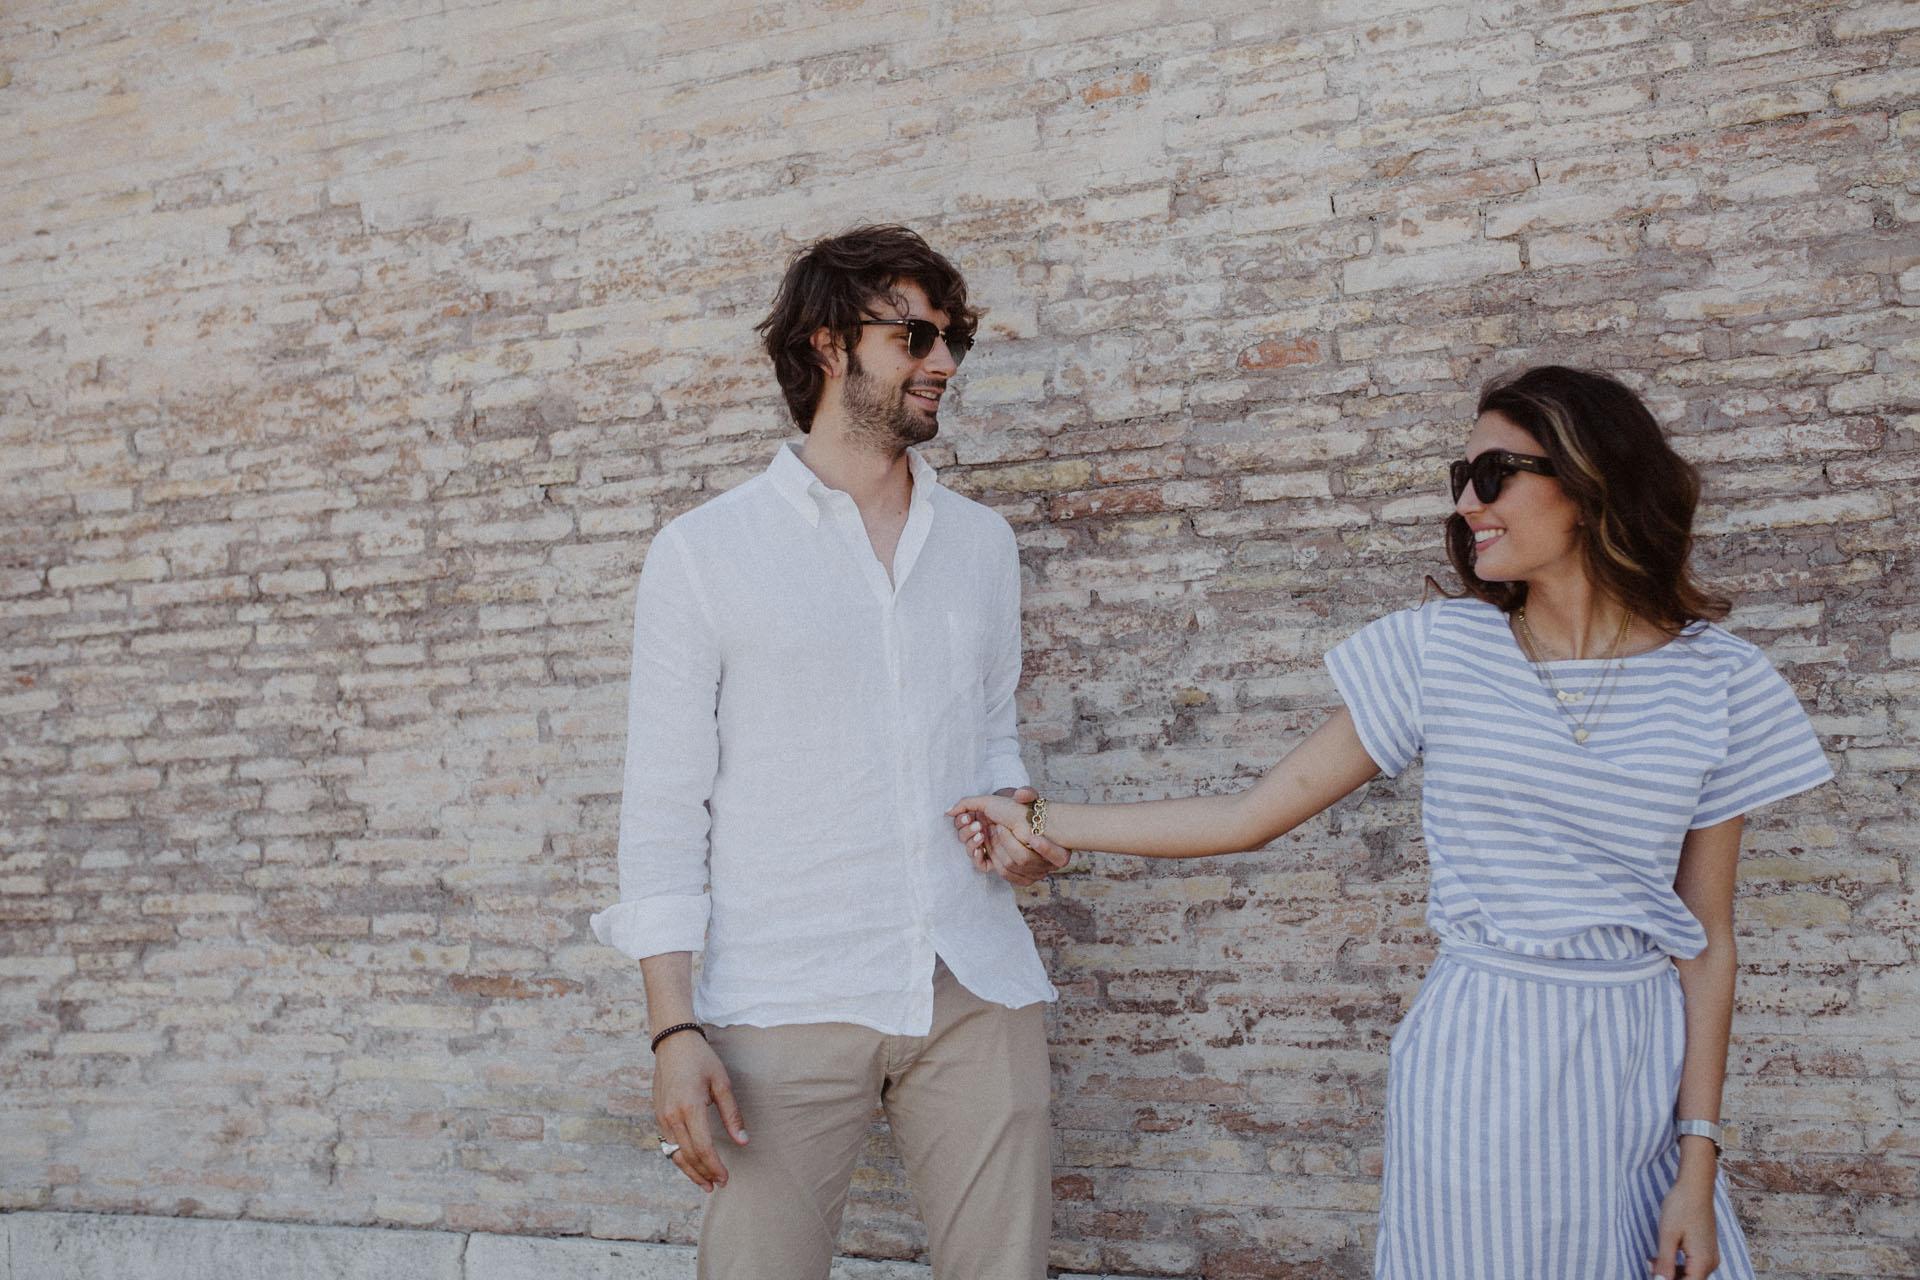 coupleshooting-roma-hochzeitsfotografen-wien-agnesundandi-31